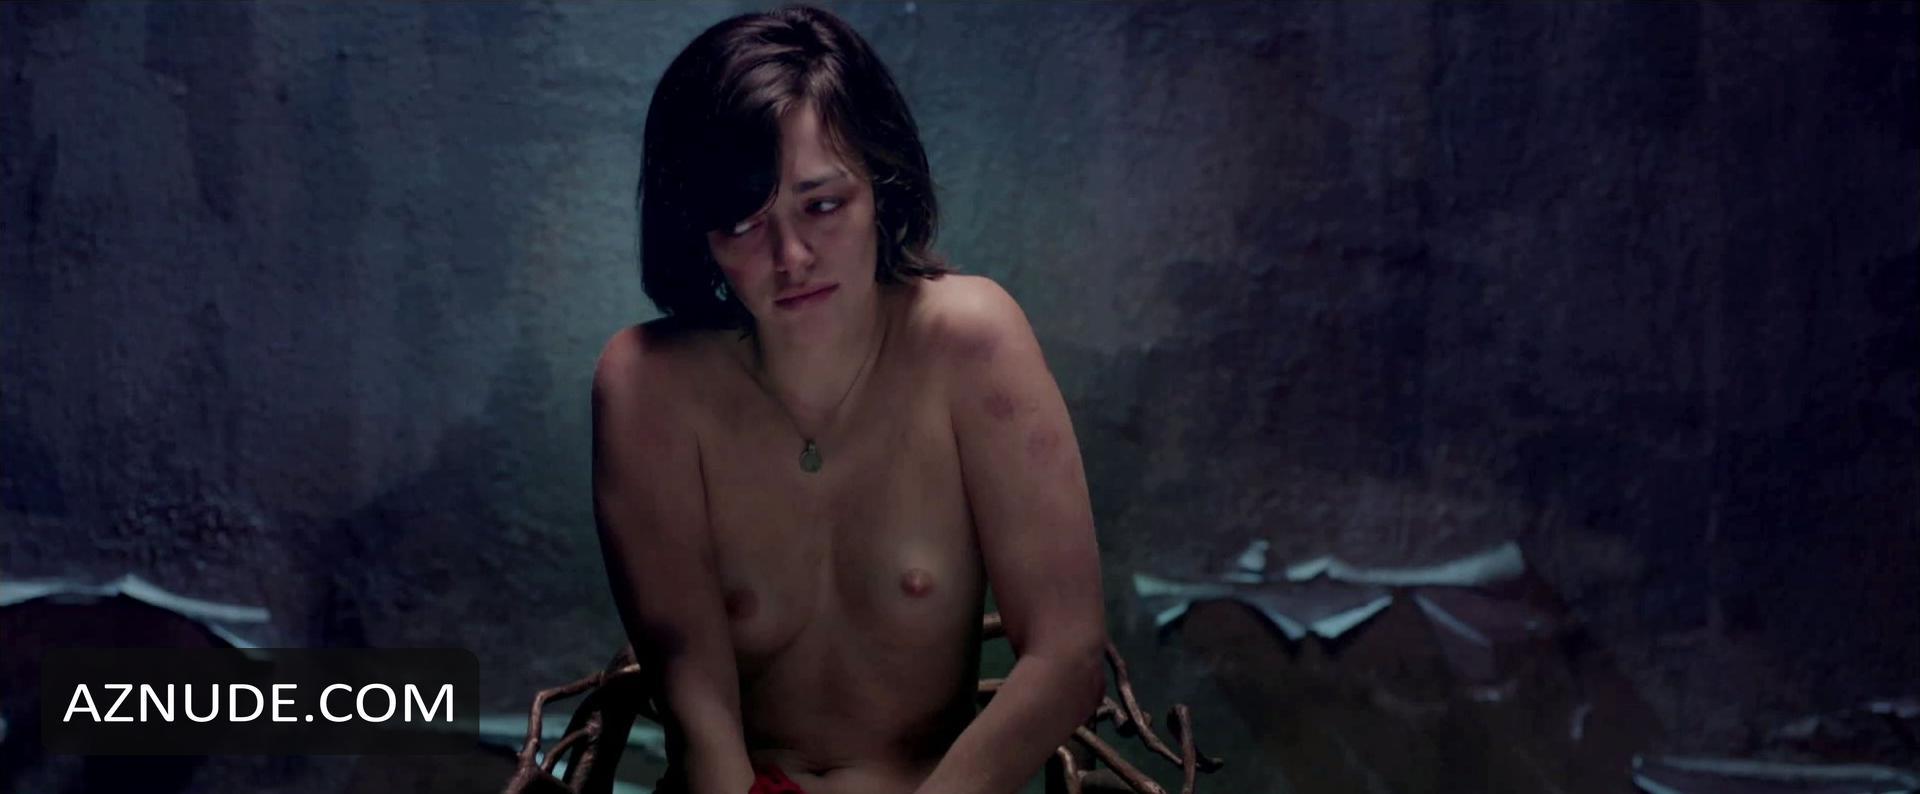 Ana Belen Topless belen chavanne nude aznude   free download nude photo gallery